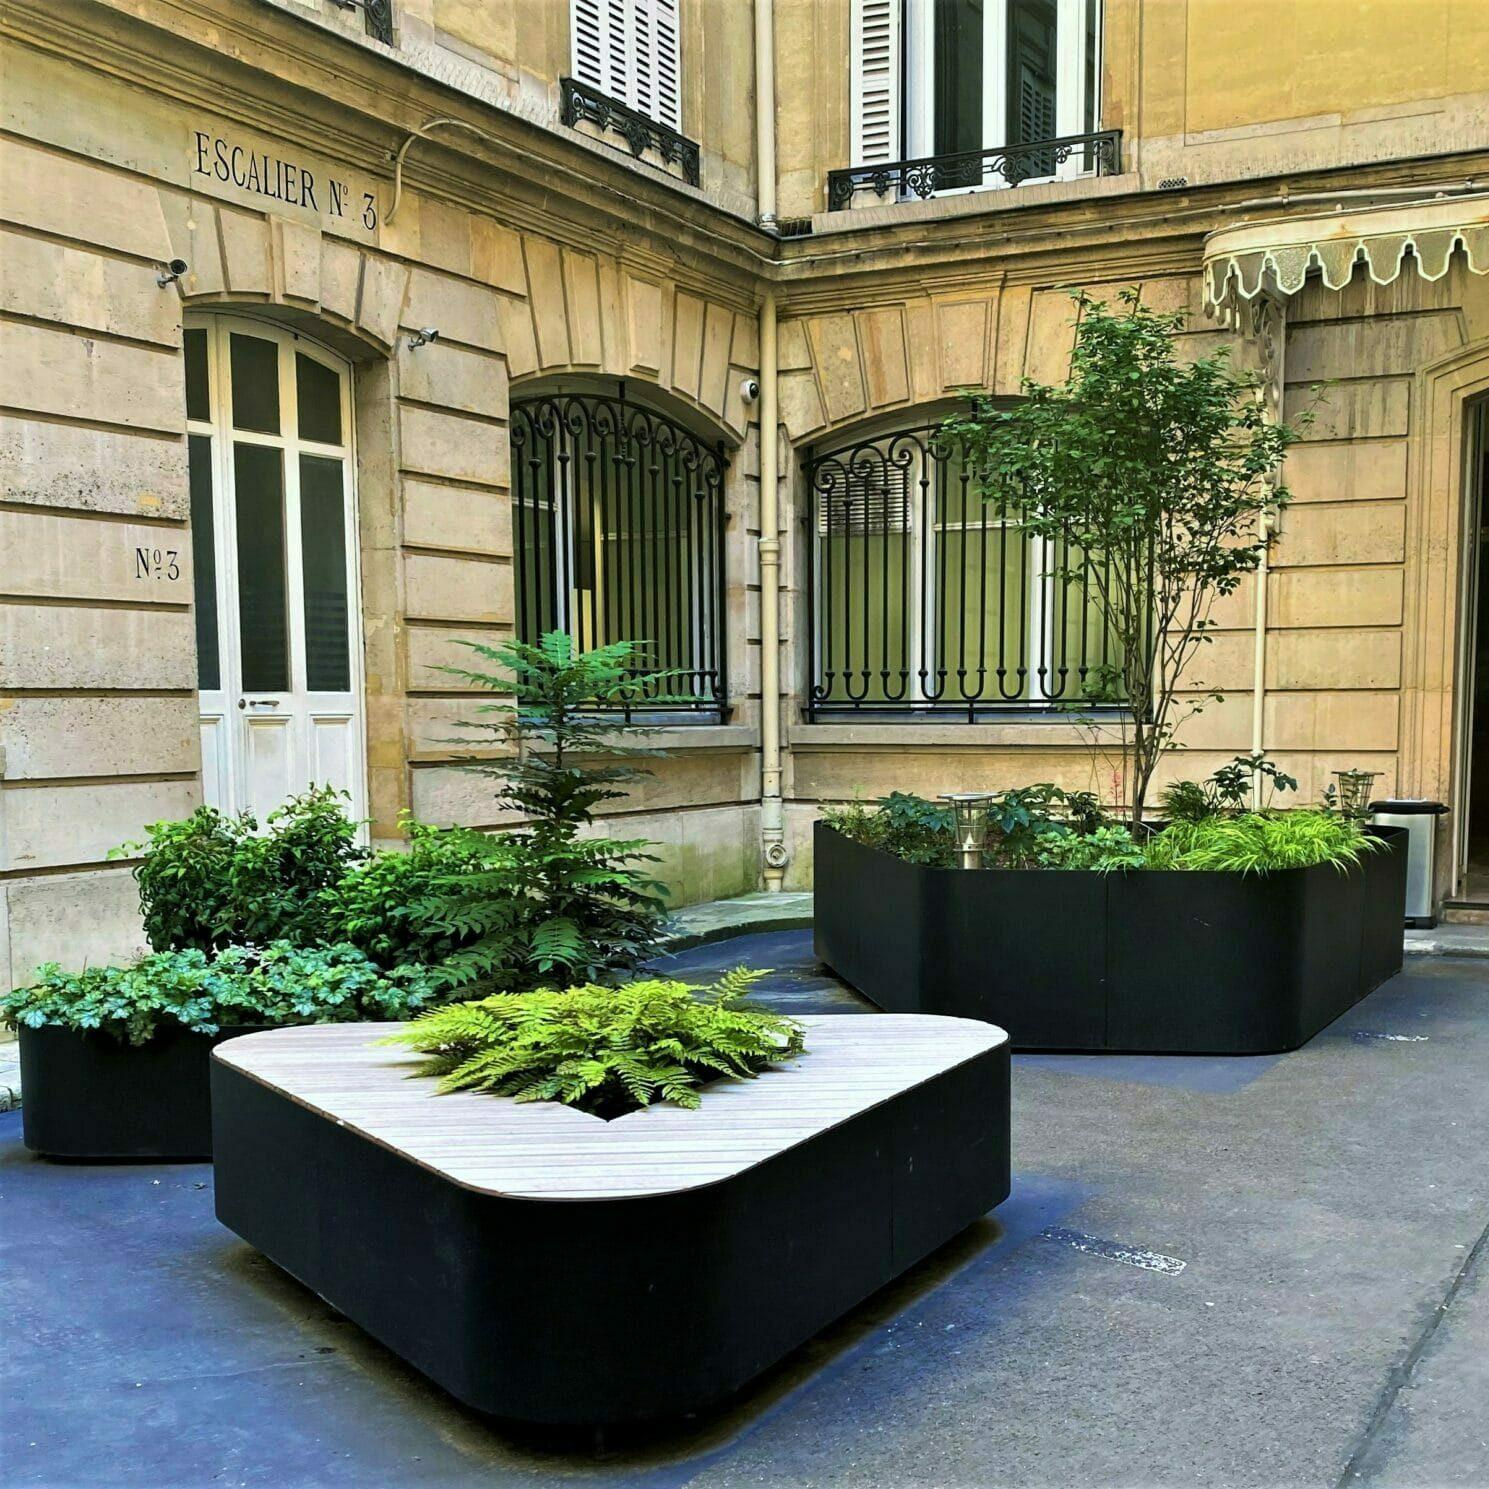 Maßgefertigte dreieckige Tabletts aus lackiertem Aluminium und Holzsitze